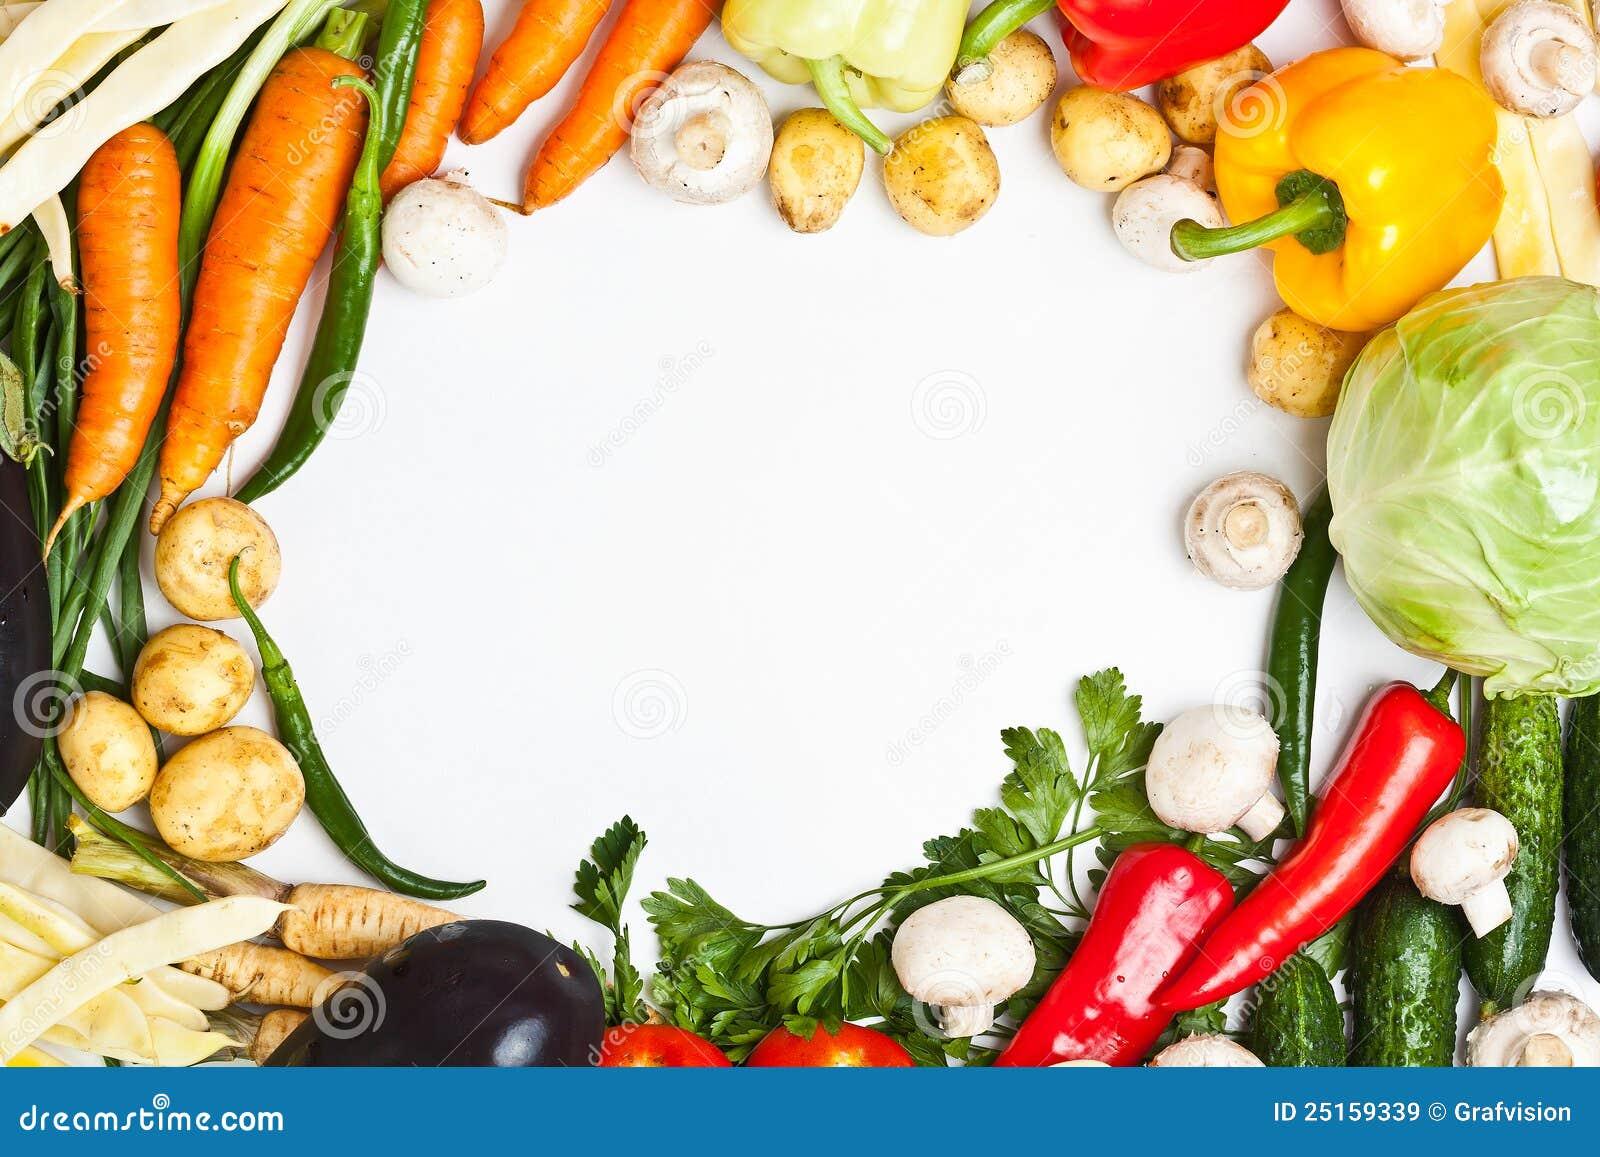 Marco vegetal colorido